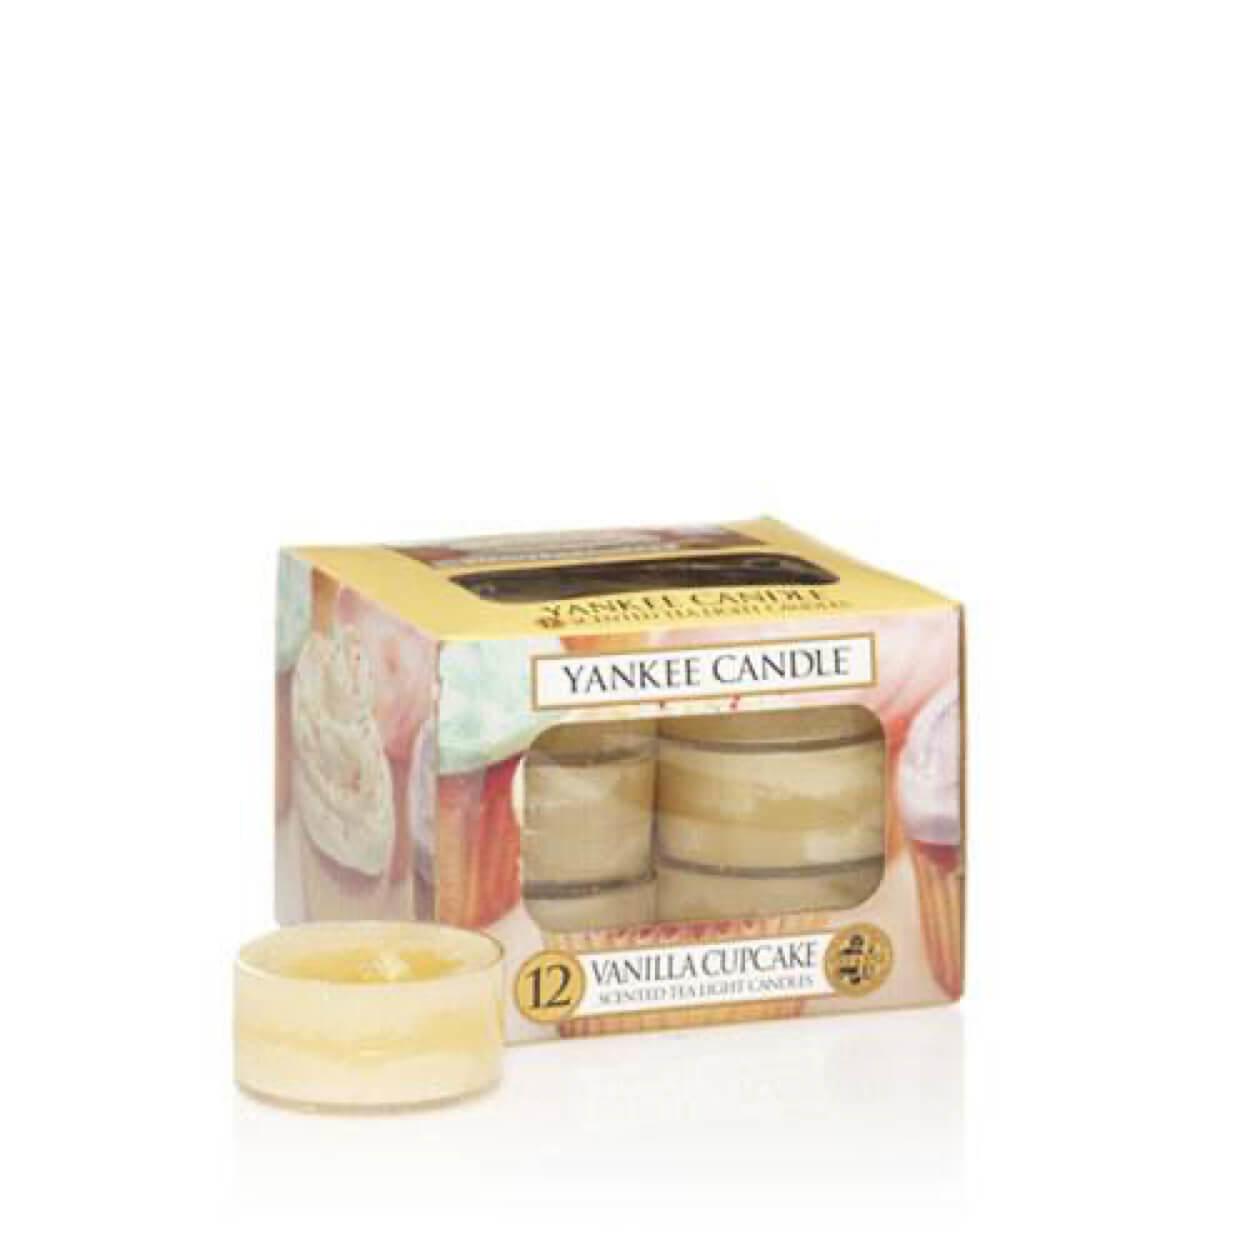 Vanilla Cupcake waxinelichtjes 12 stuks | Yankee Candle